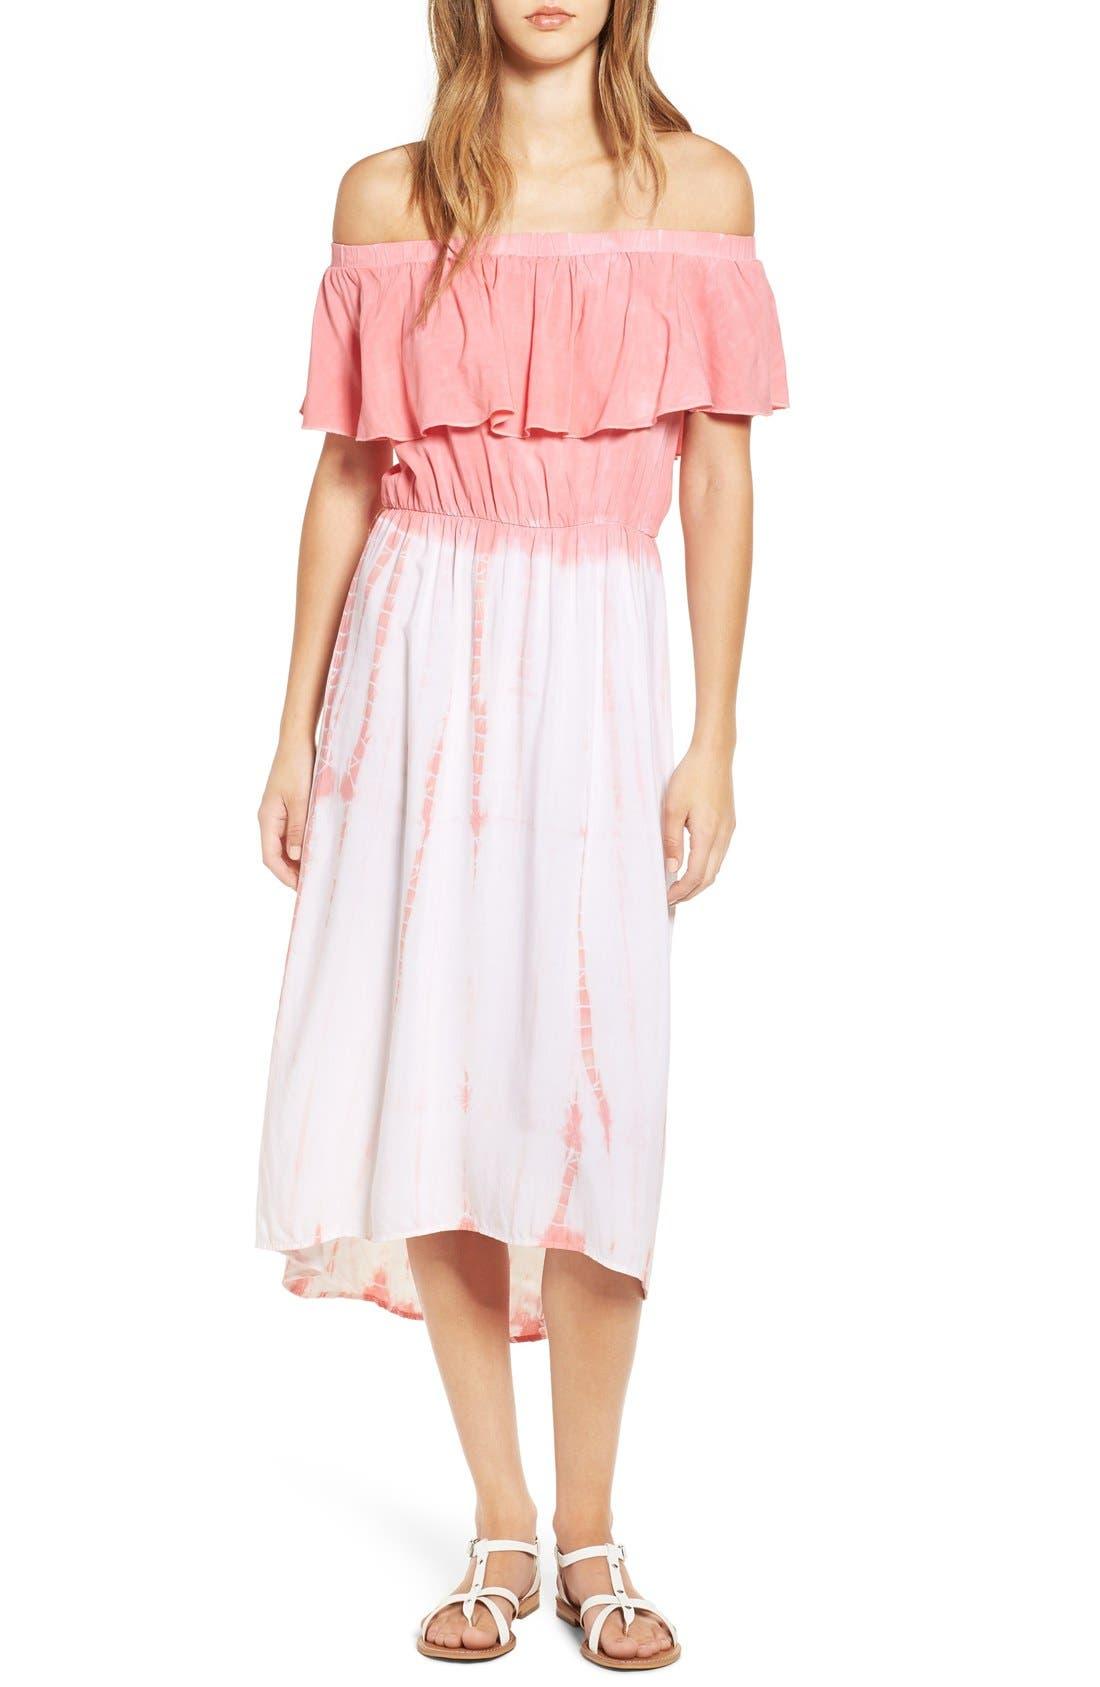 Main Image - jella c. Off the Shoulder Tie Dye Midi Dress